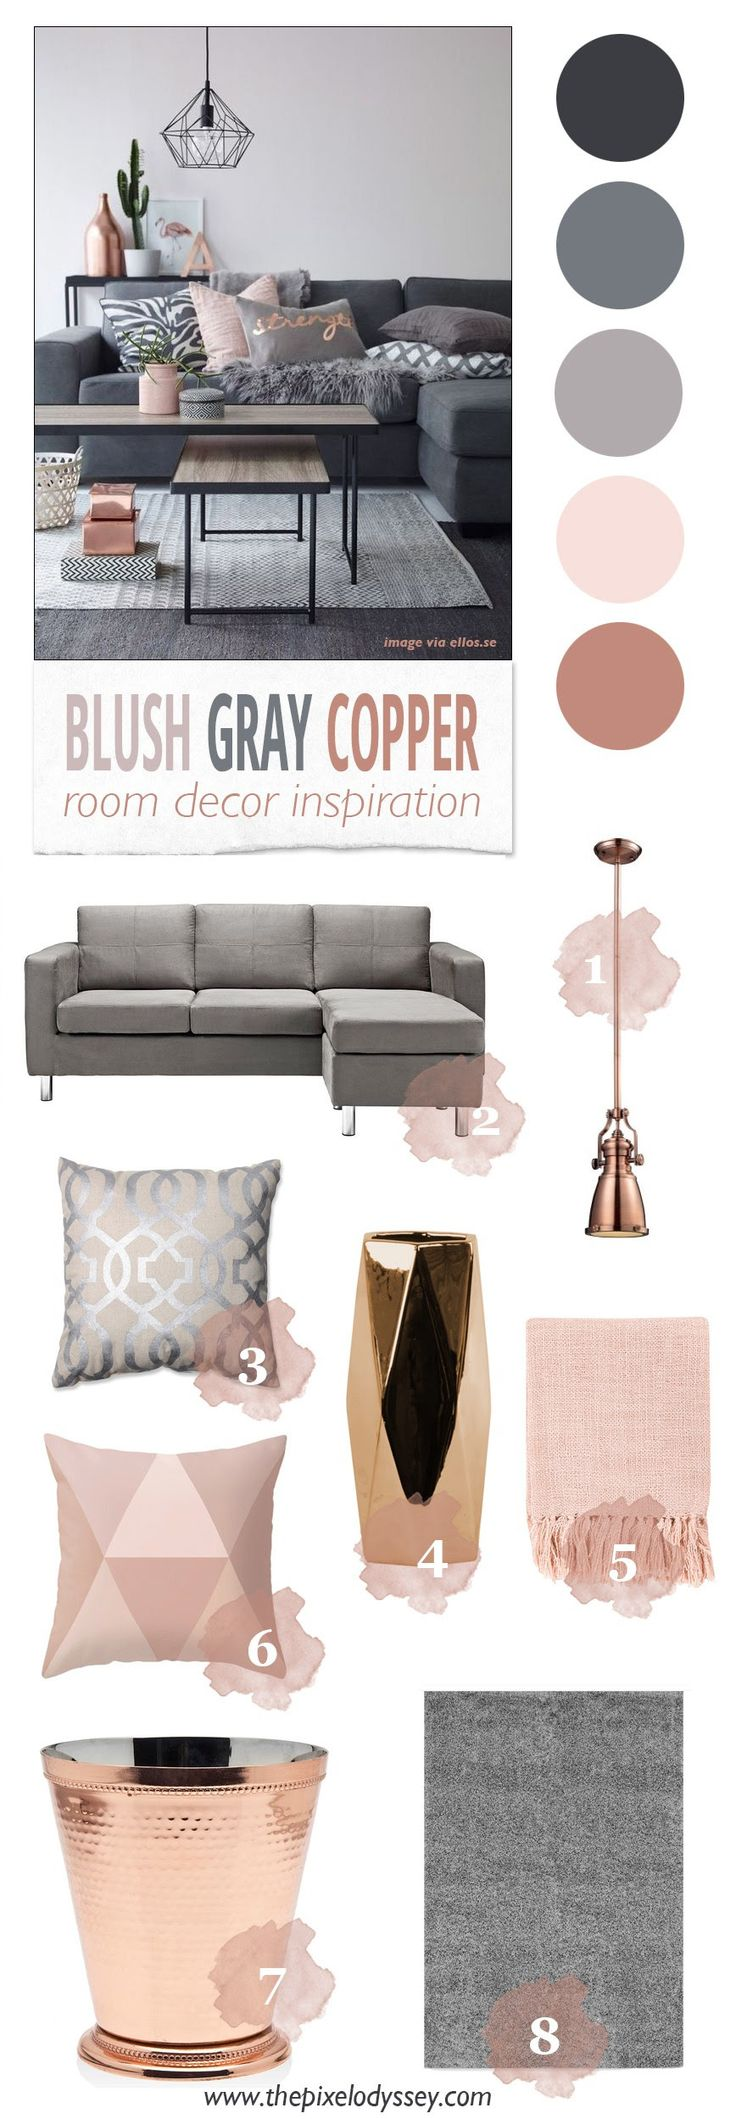 7 best Salotto images on Pinterest   Living room ideas, Dinner ...